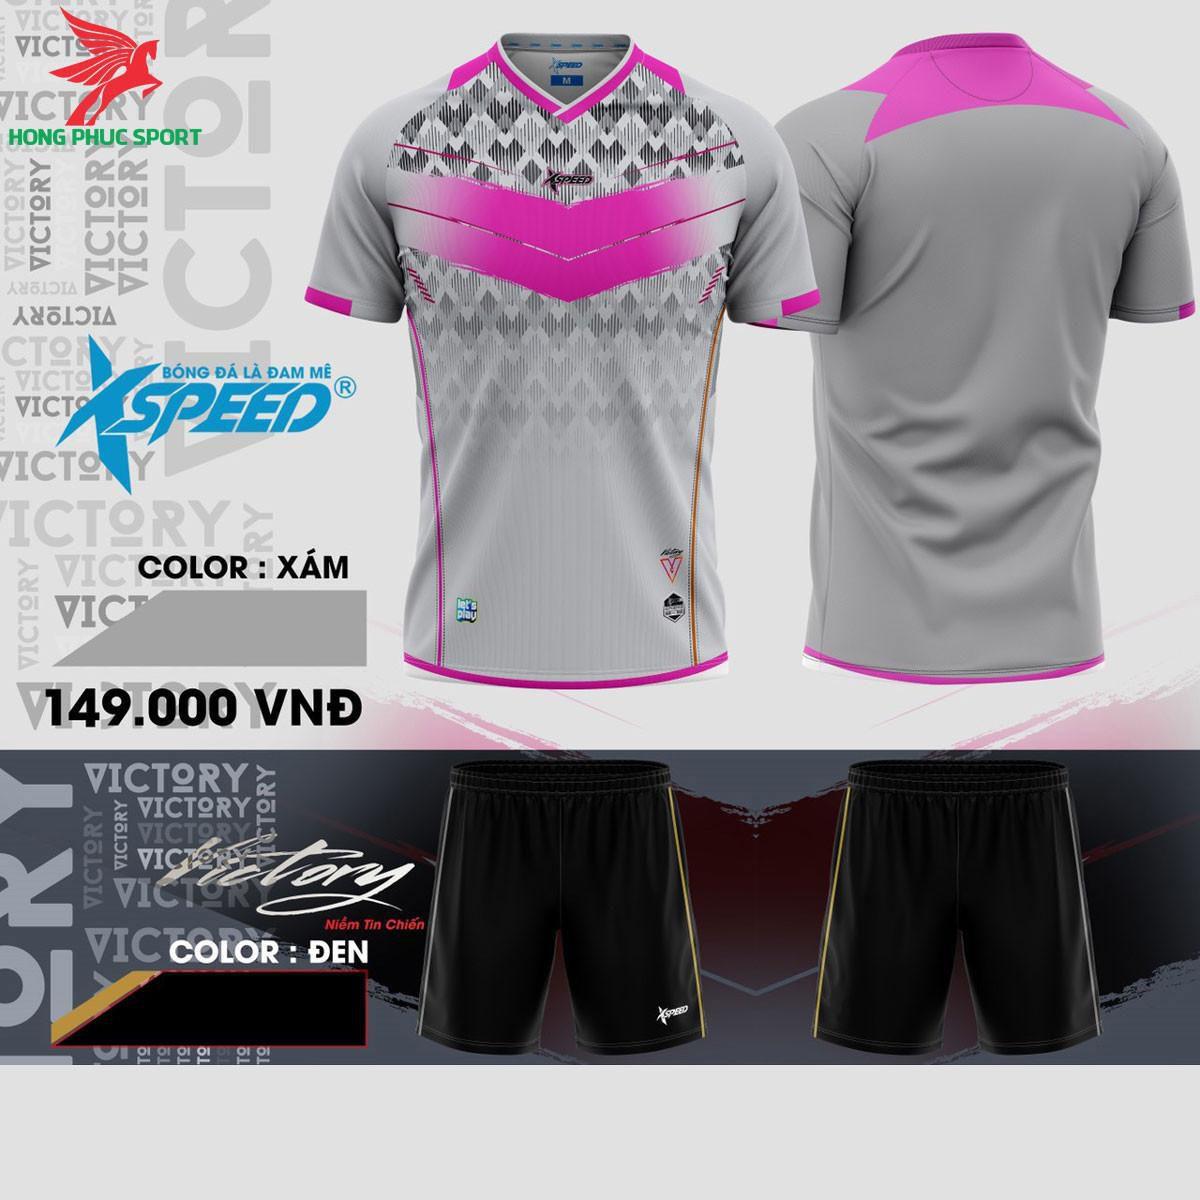 https://cdn.hongphucsport.com/unsafe/s4.shopbay.vn/files/285/ao-khong-logo-xspeed-victory-mau-xam-60516cba18c6d.jpg